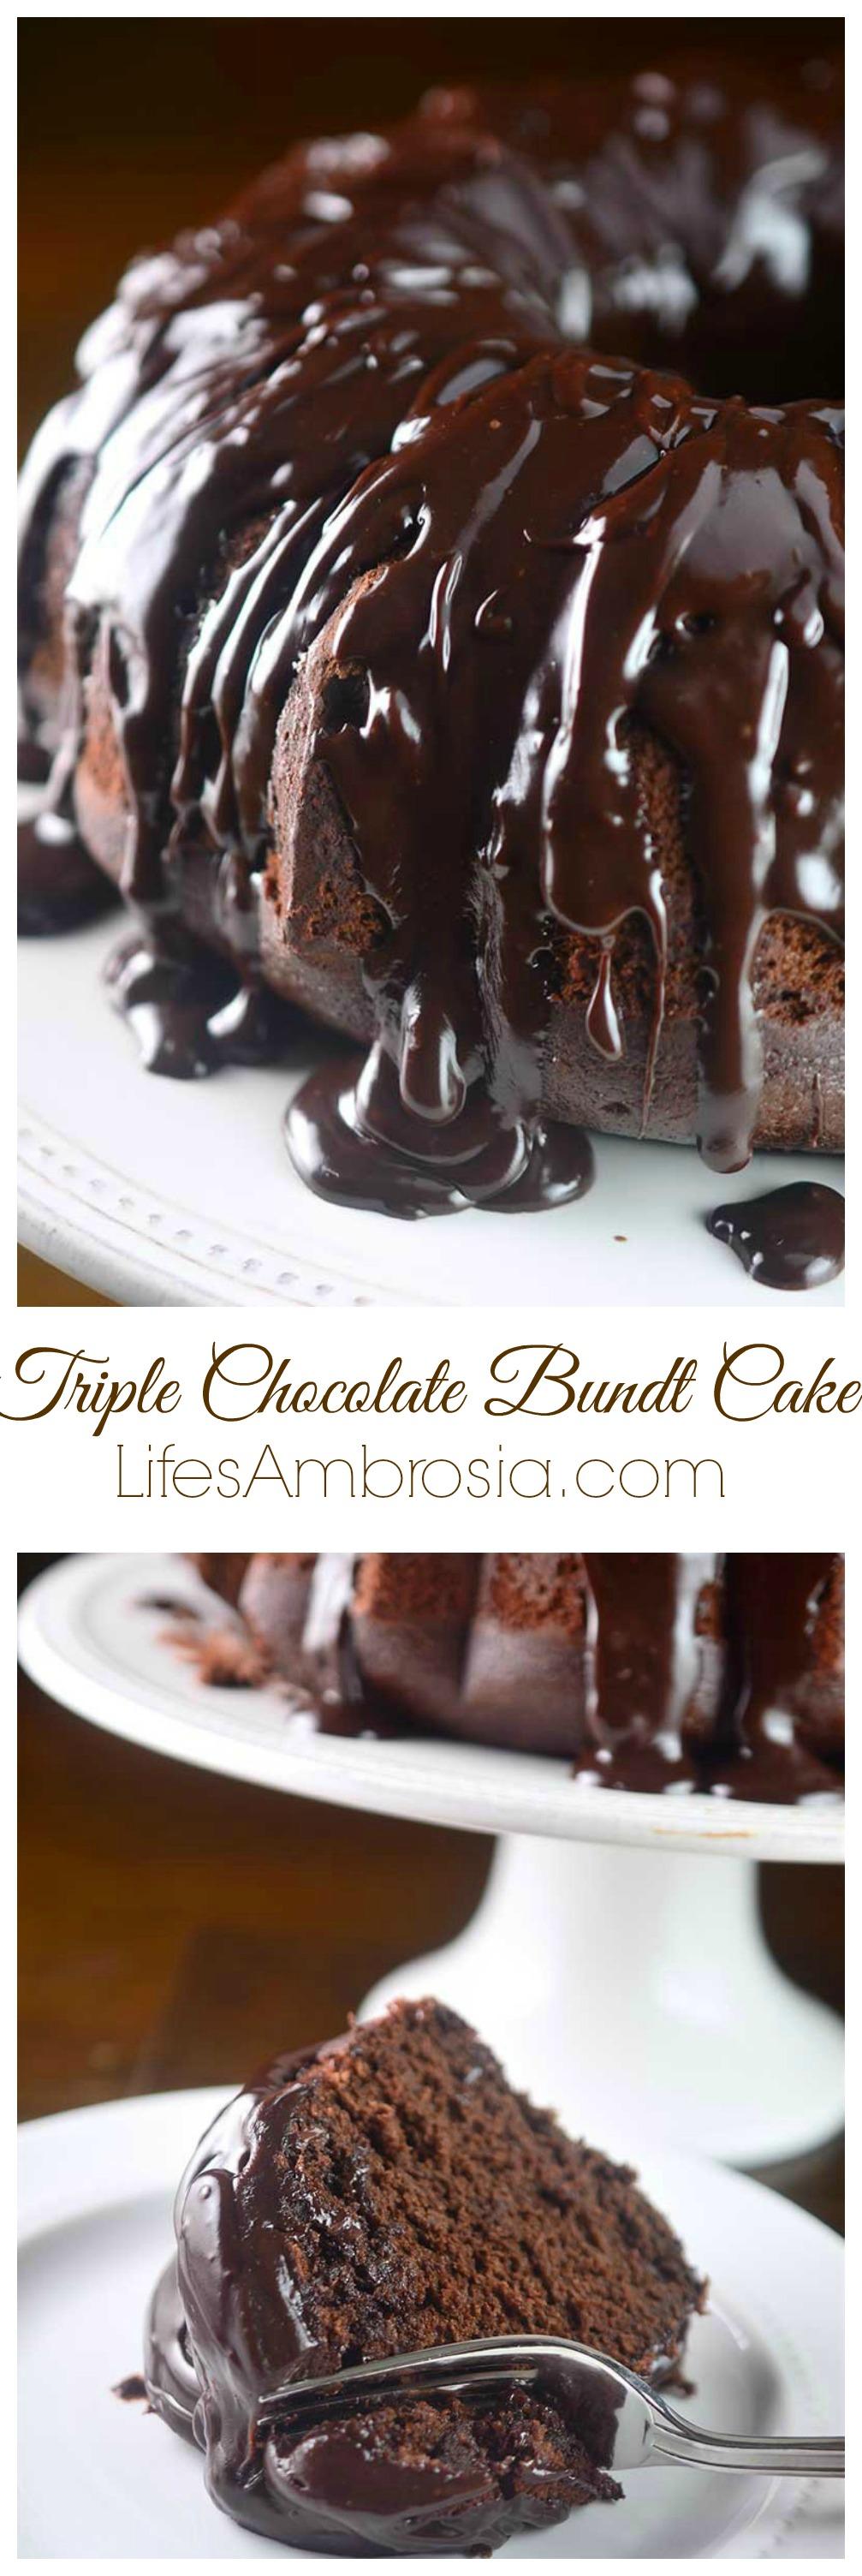 Triple Chocolate Bundt Cake - Life's Ambrosia